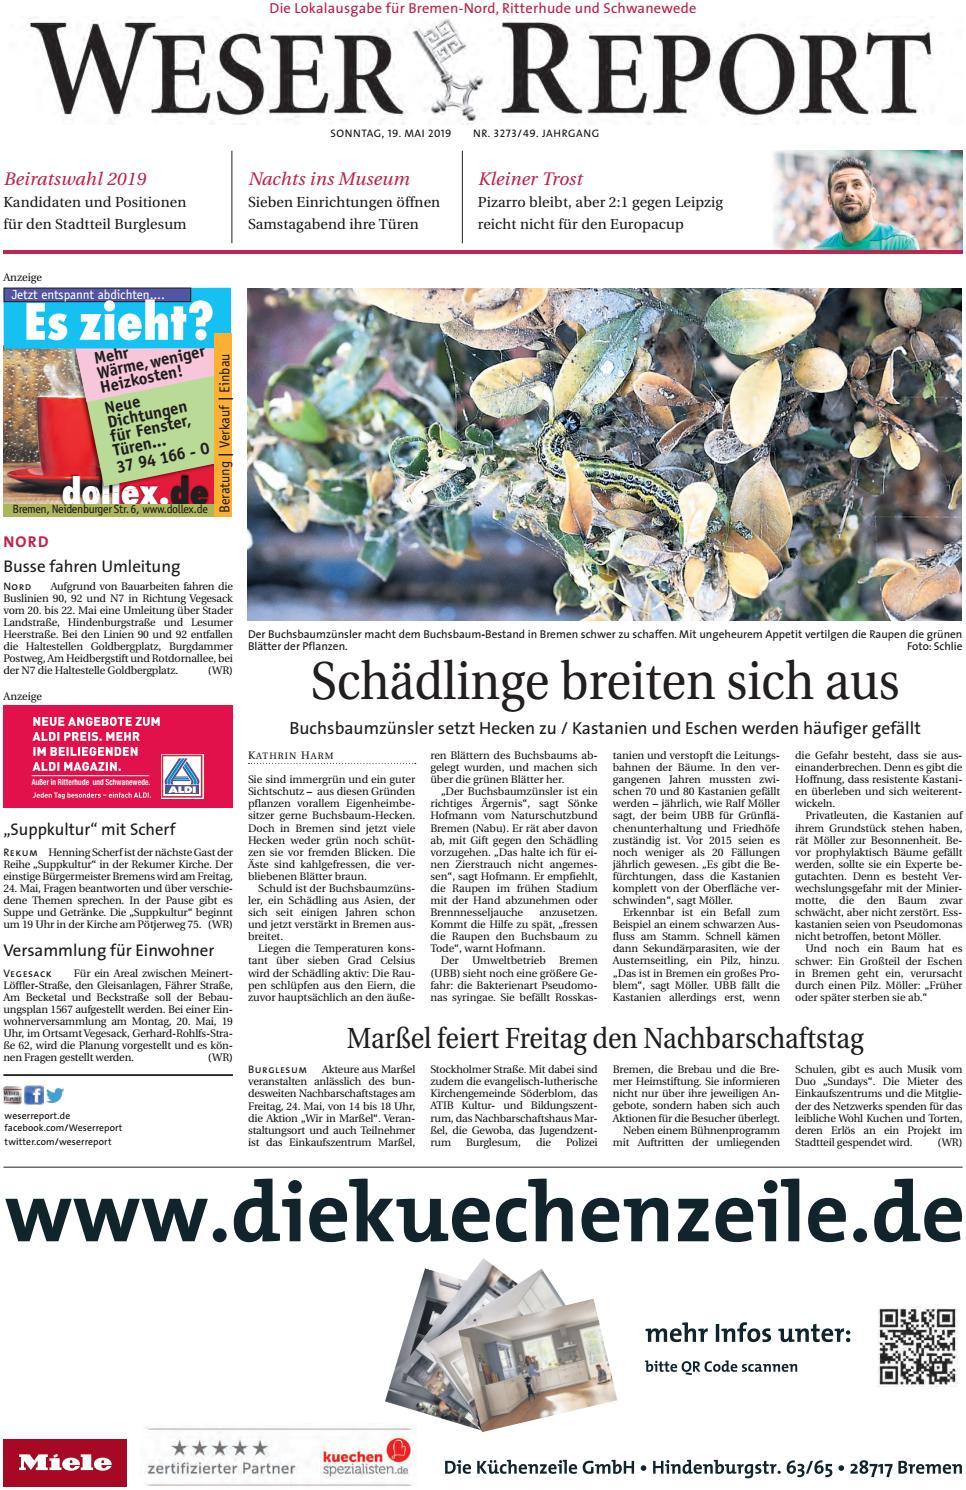 Weser Report - Nord vom 19.05.2019 by KPS Verlagsgesellschaft mbH ...